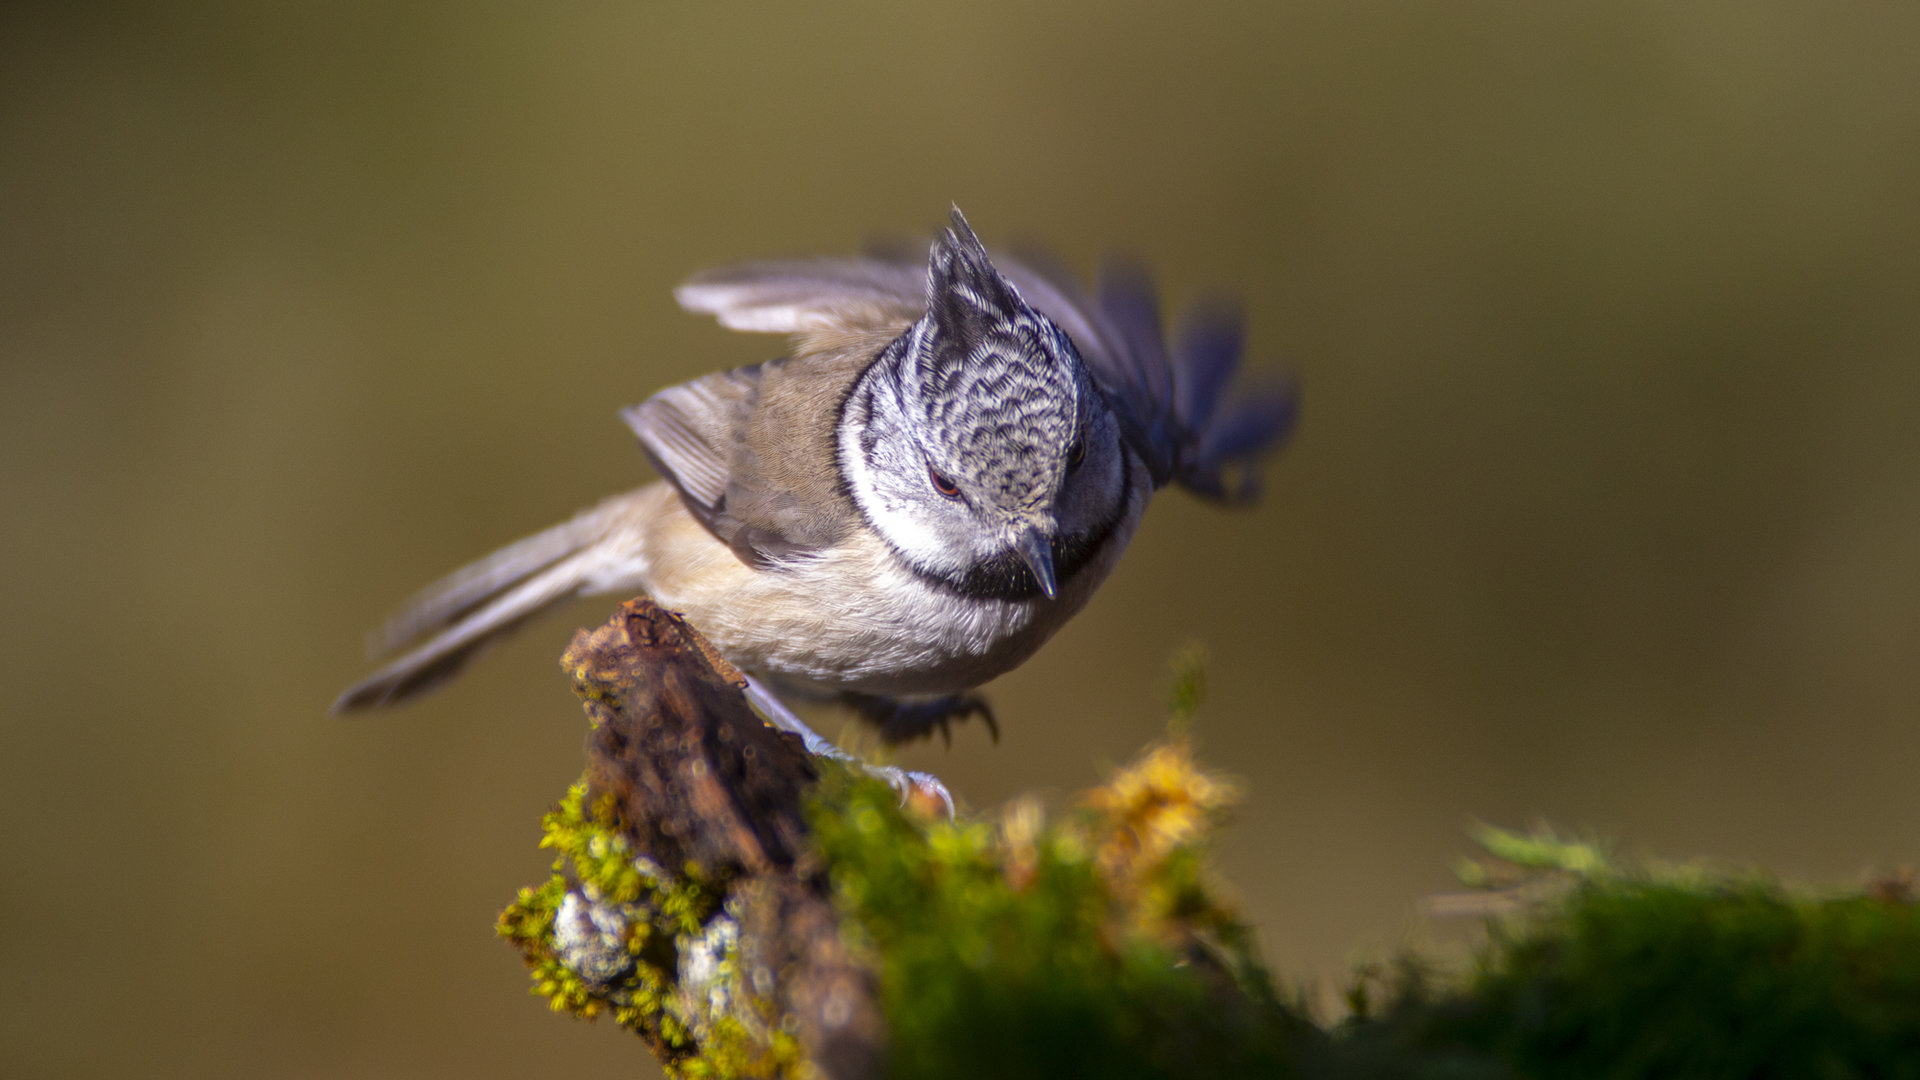 Photo in Wild life | Author LorDDemoniC | PHOTO FORUM